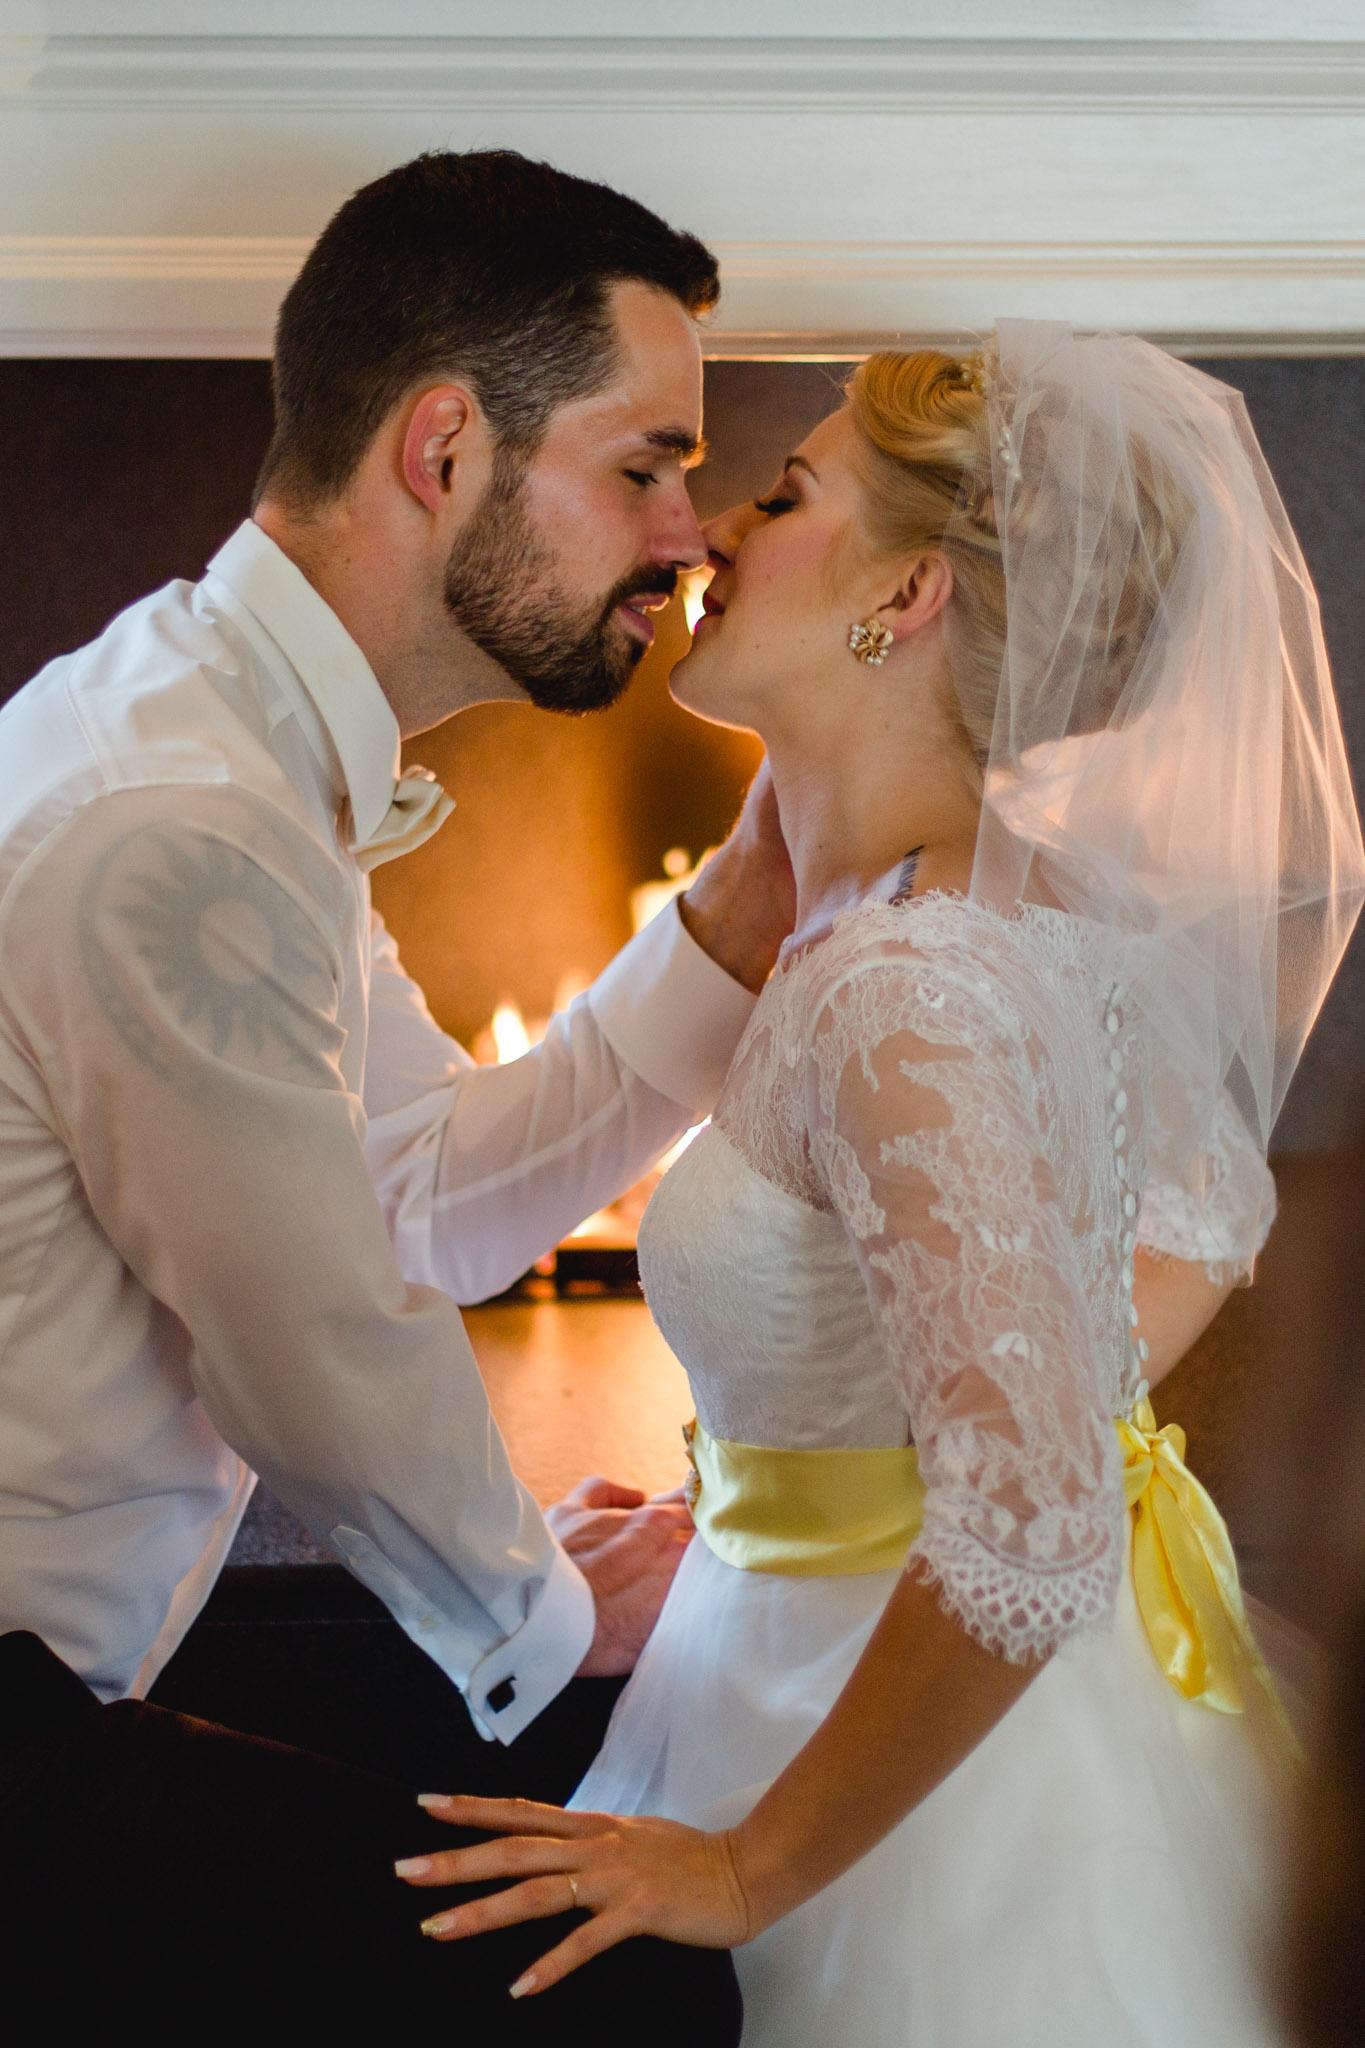 küssendes Brautpaar am Kamin